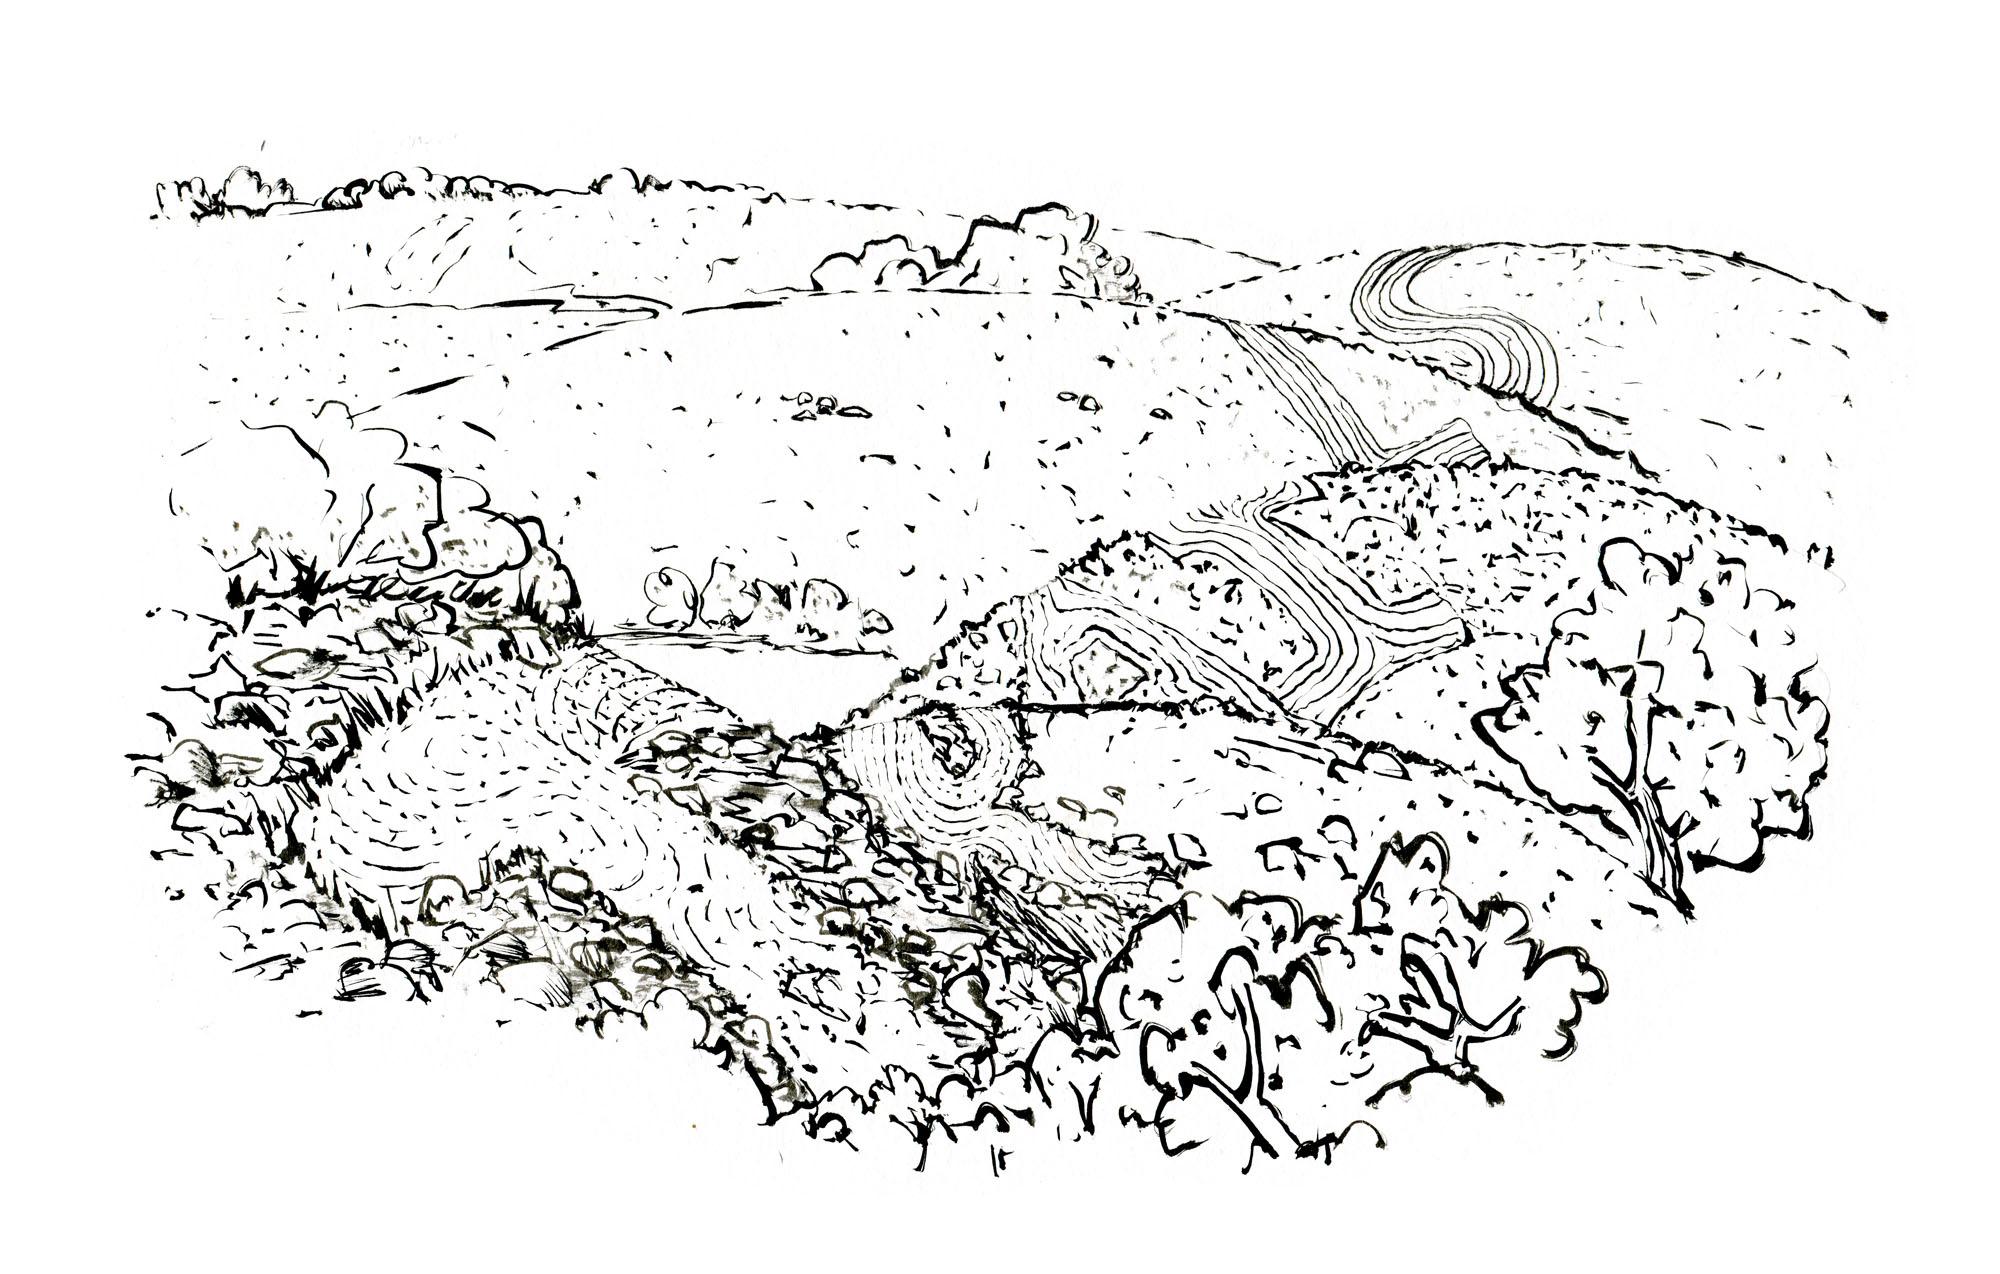 Hiking trail sketch – Hikingorg.wordpress.com